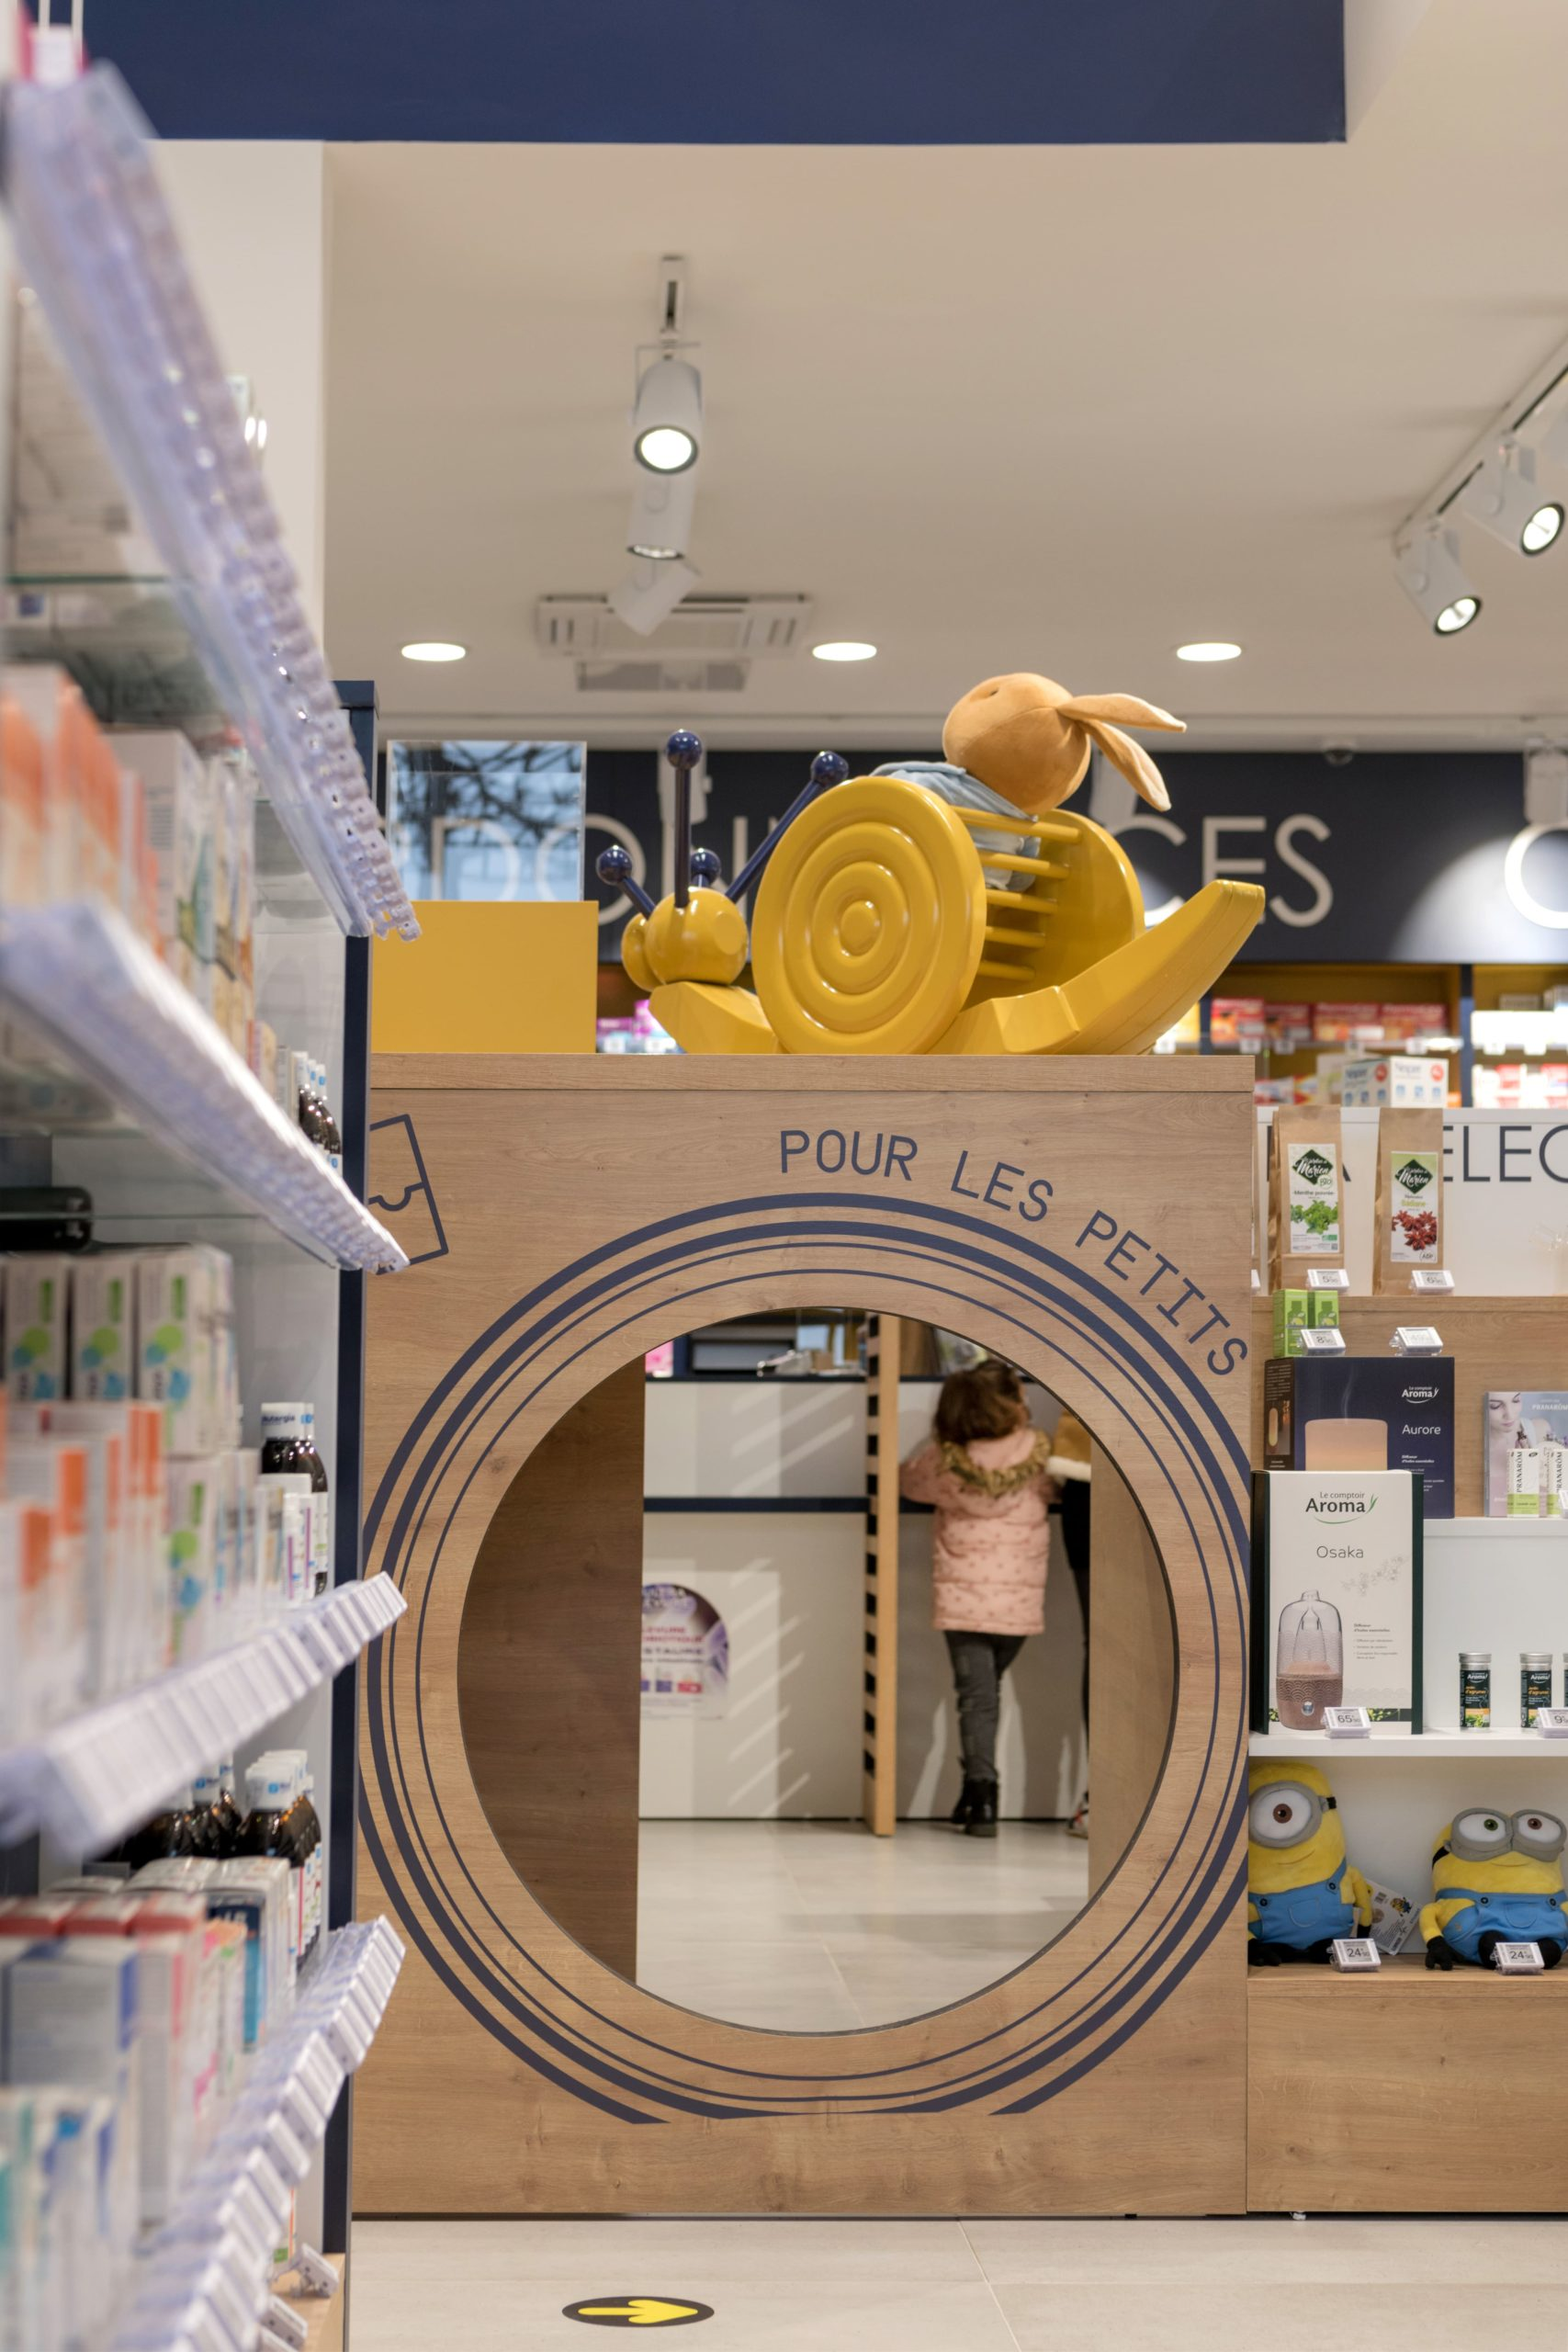 Pharmacie-Gagnaire-Issoire-Cubik-Agenceur-13-min